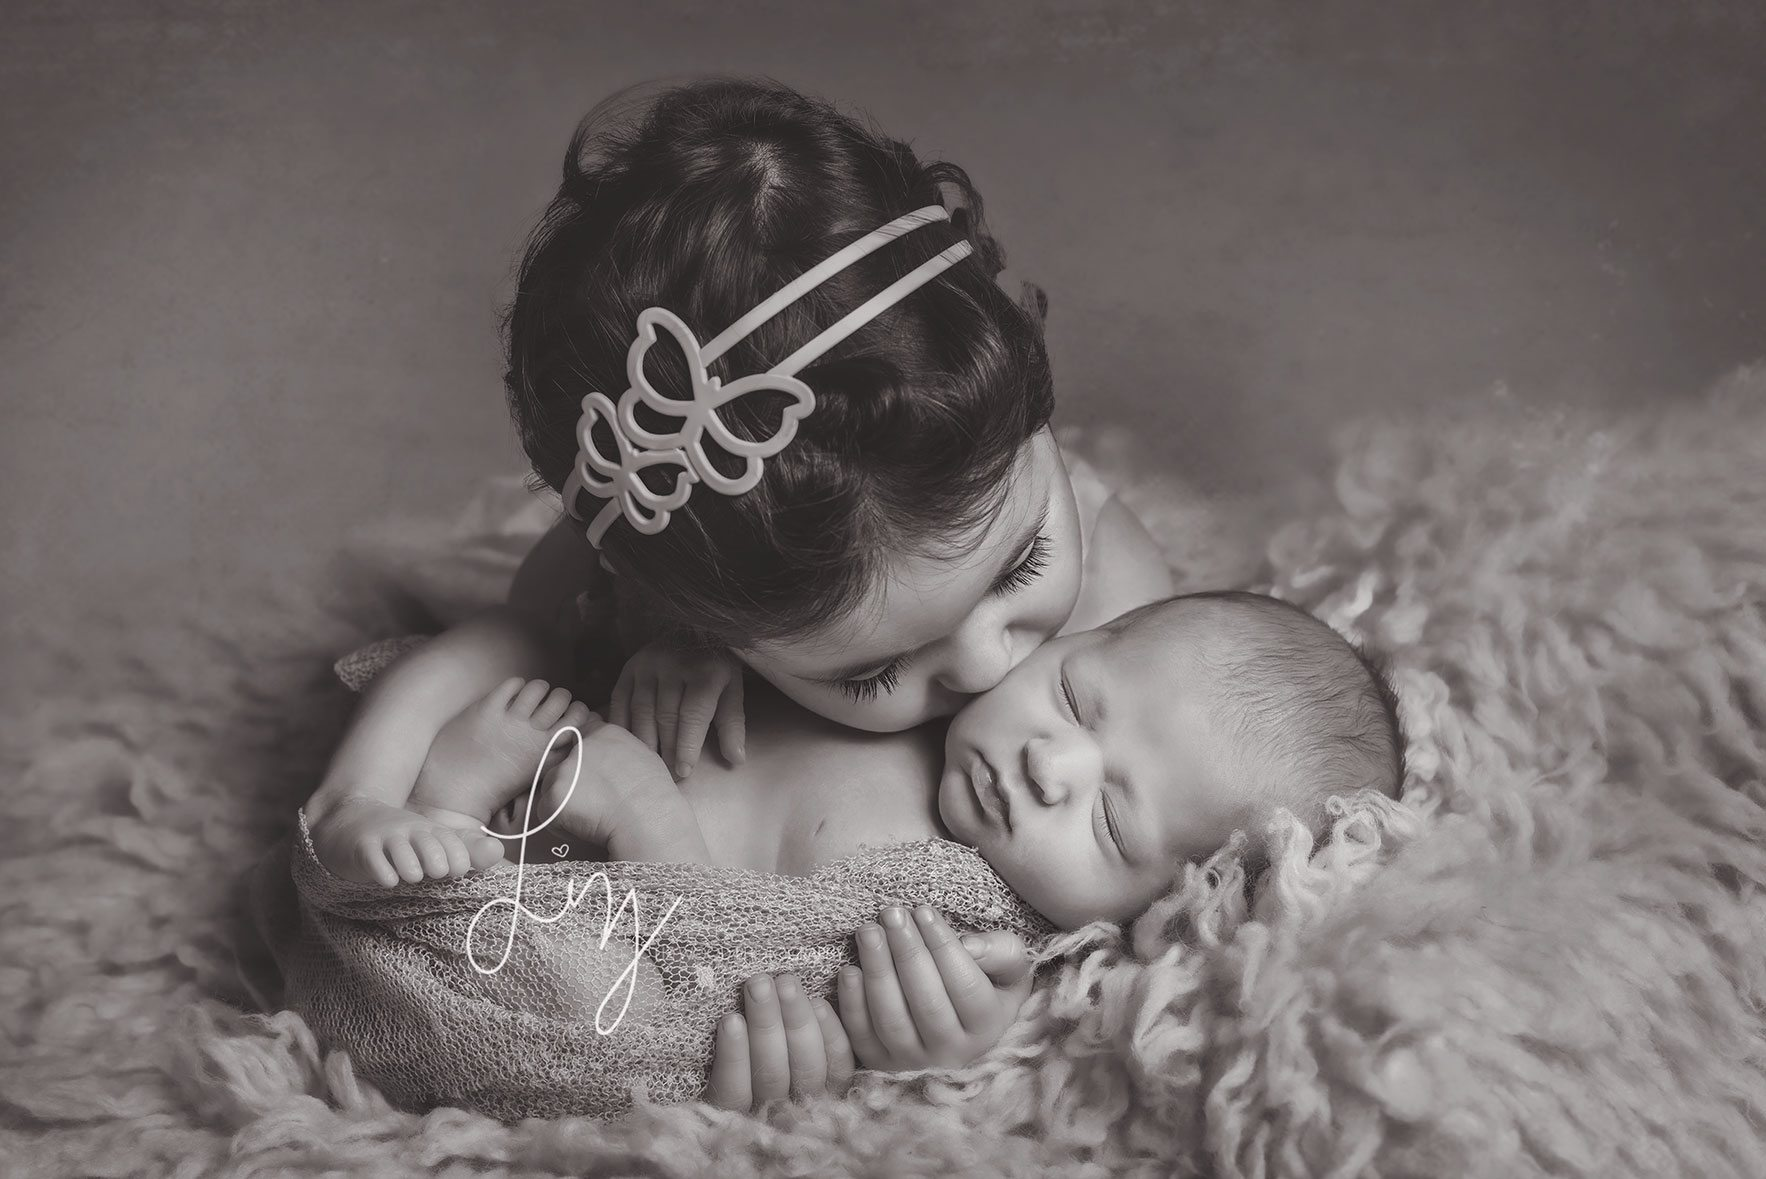 Sister cuddling her new baby sister on her newborn shoot - Essex newborn photographer